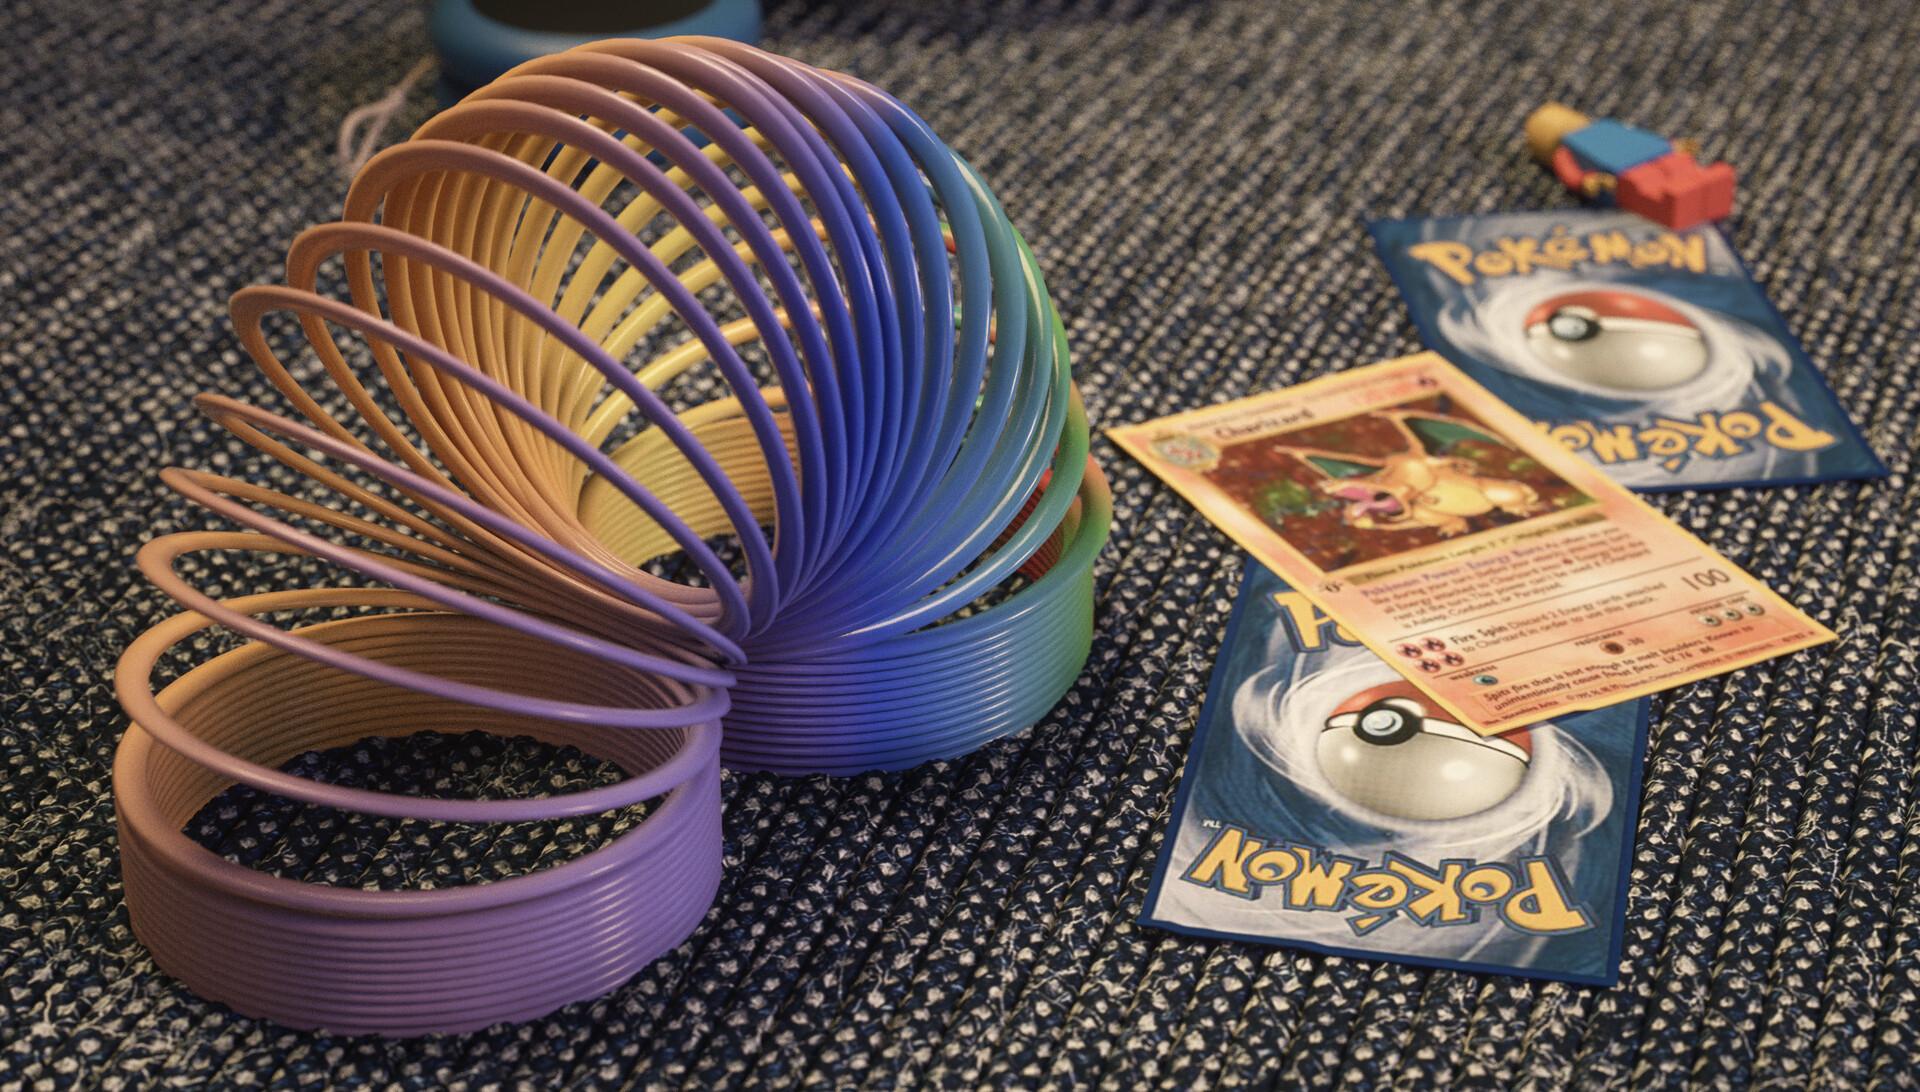 Slinkys, Lego and Pokemon cards :)